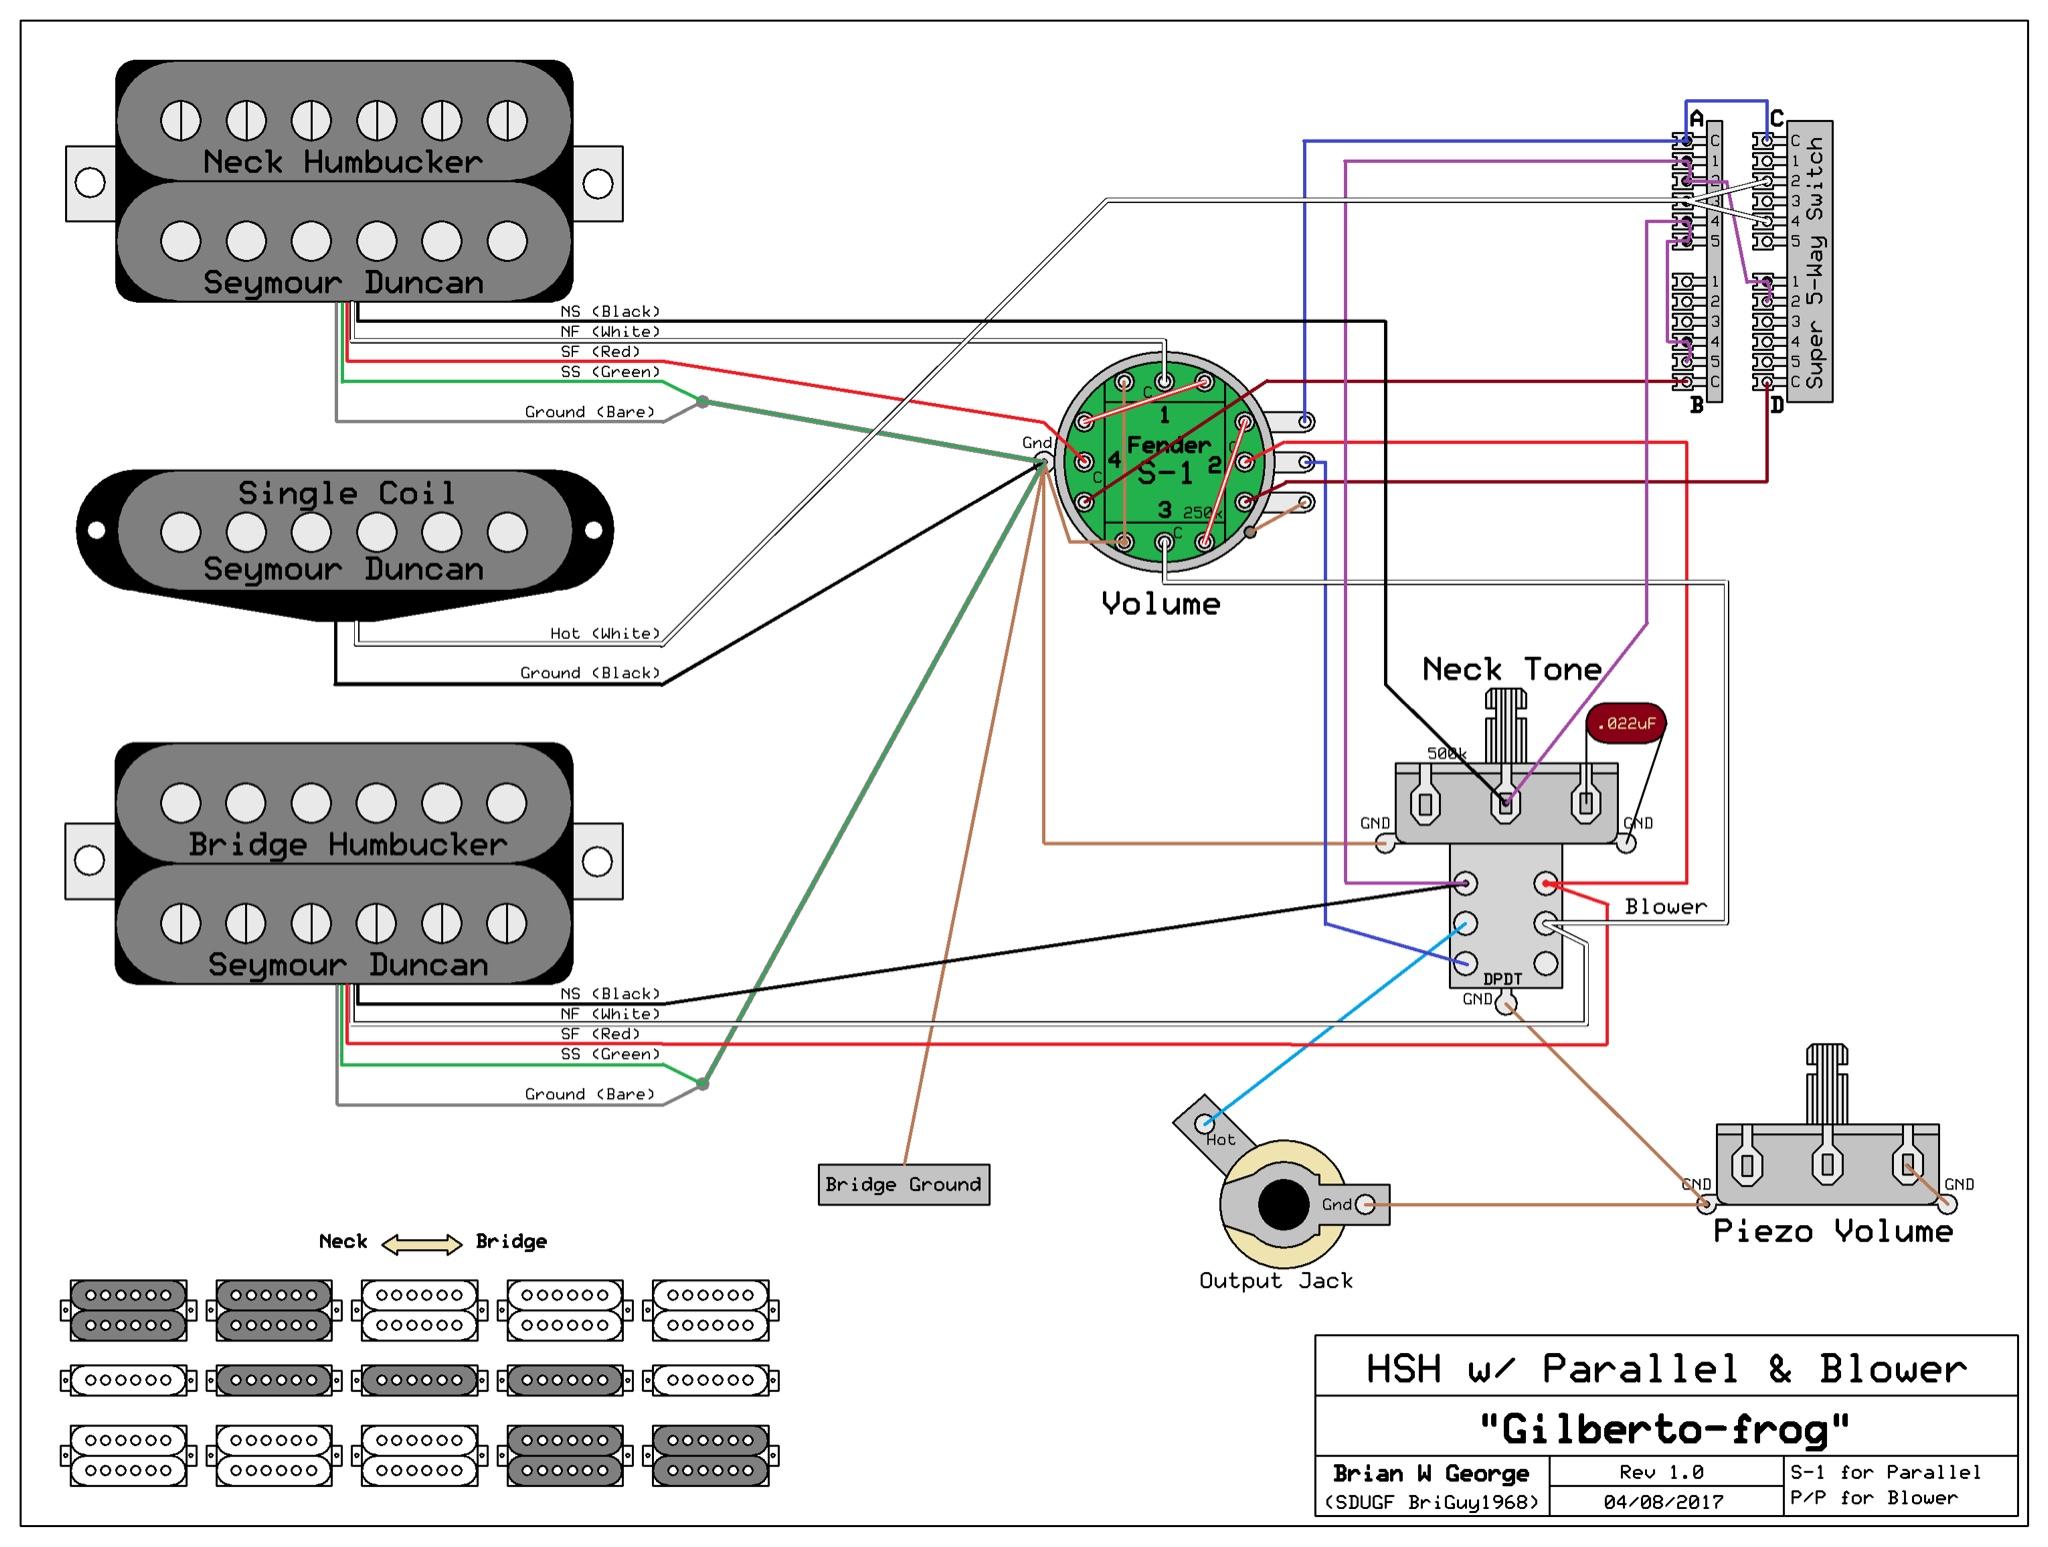 yamaha pacifica wiring diagram 3 way switch ladder hss 1 vol tone